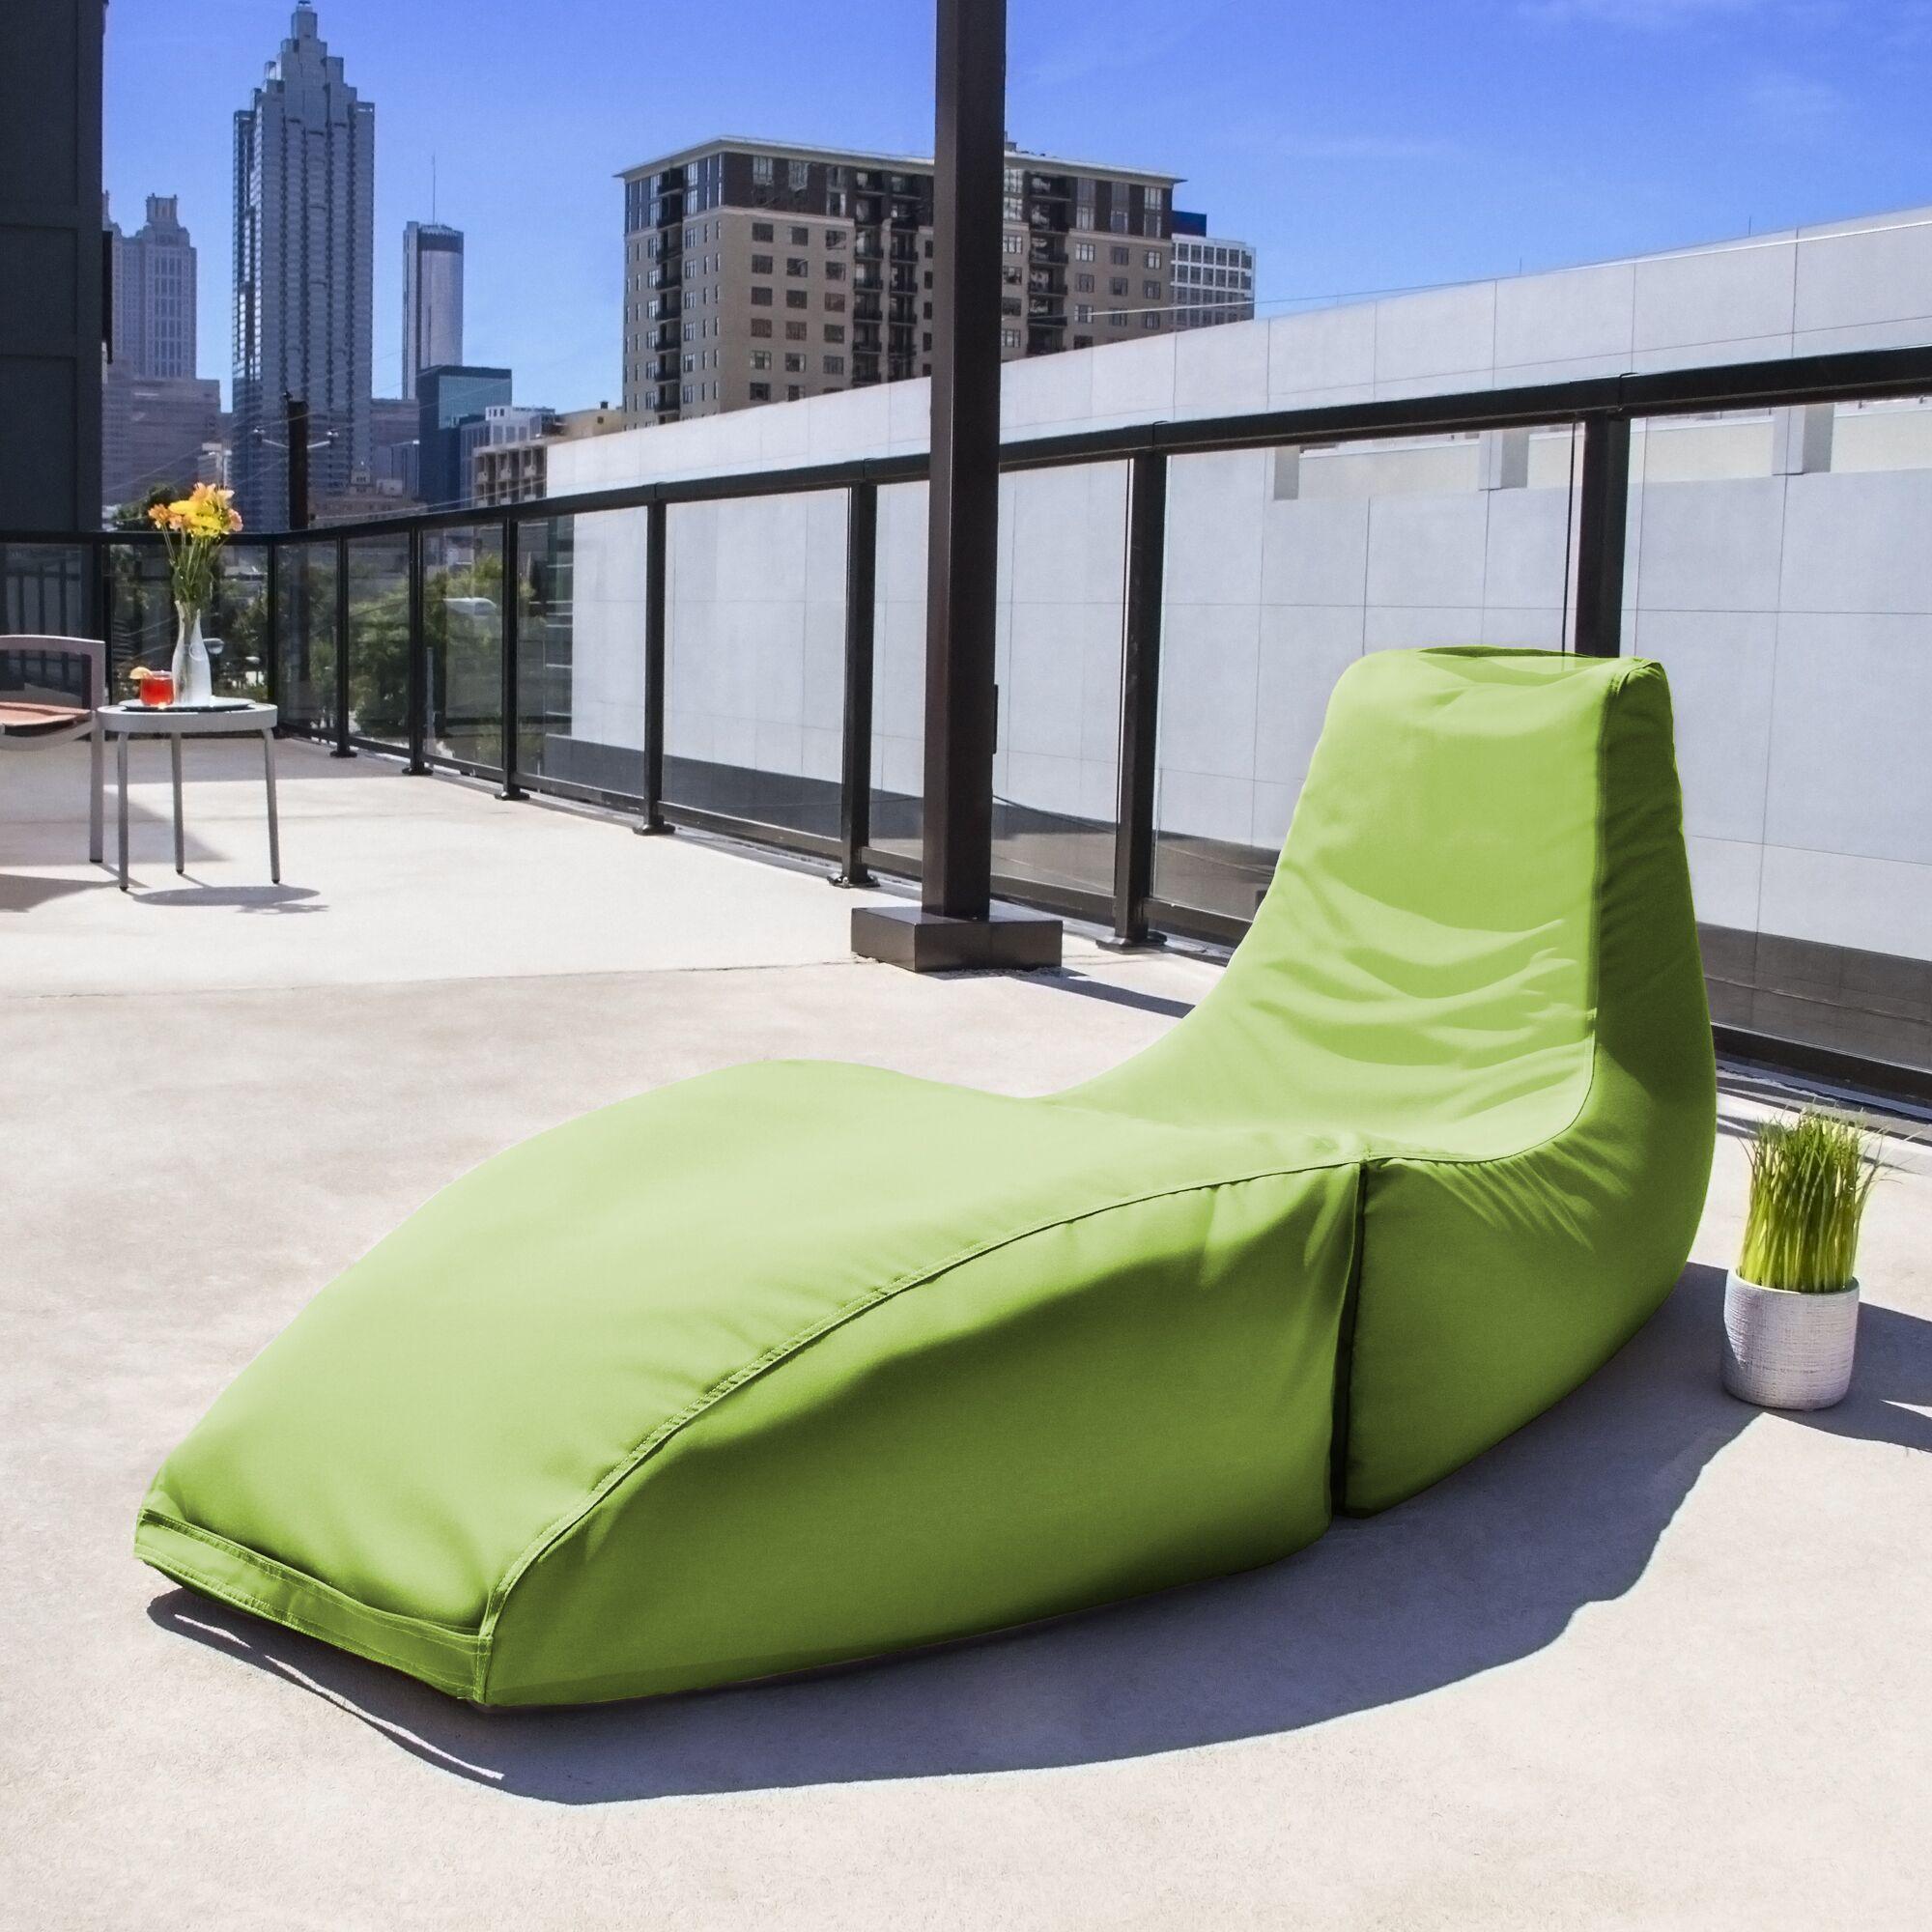 Prado Outdoor Bean Bag Chaise Lounge Chair Color: Lime Green